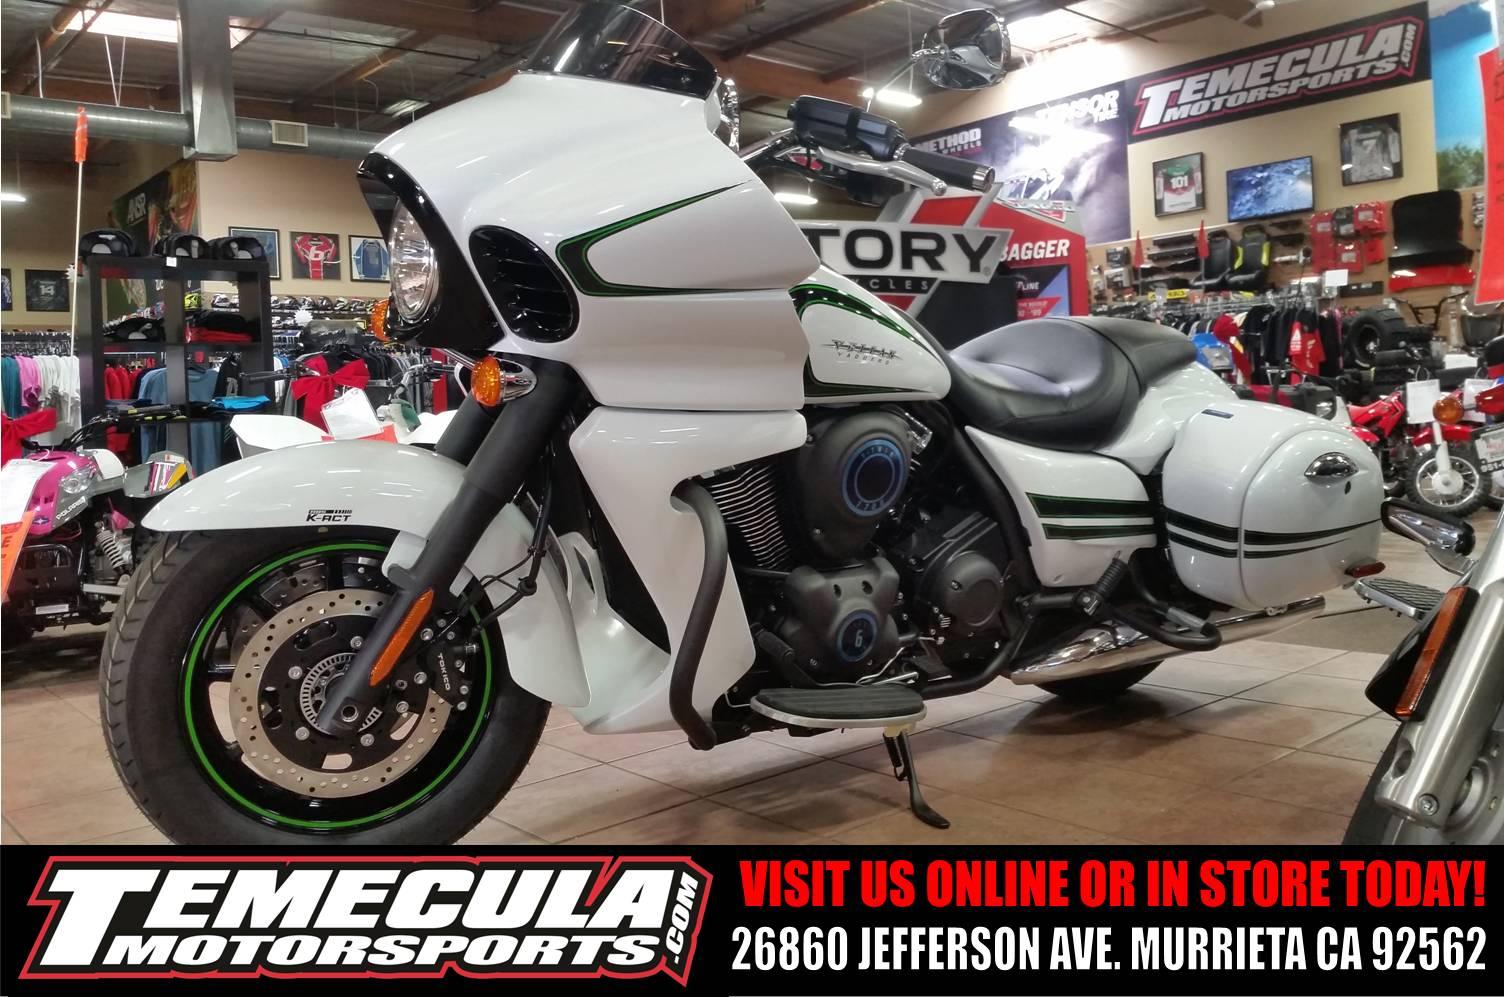 2016 Kawasaki Vulcan 1700 Vaquero ABS in Murrieta, California